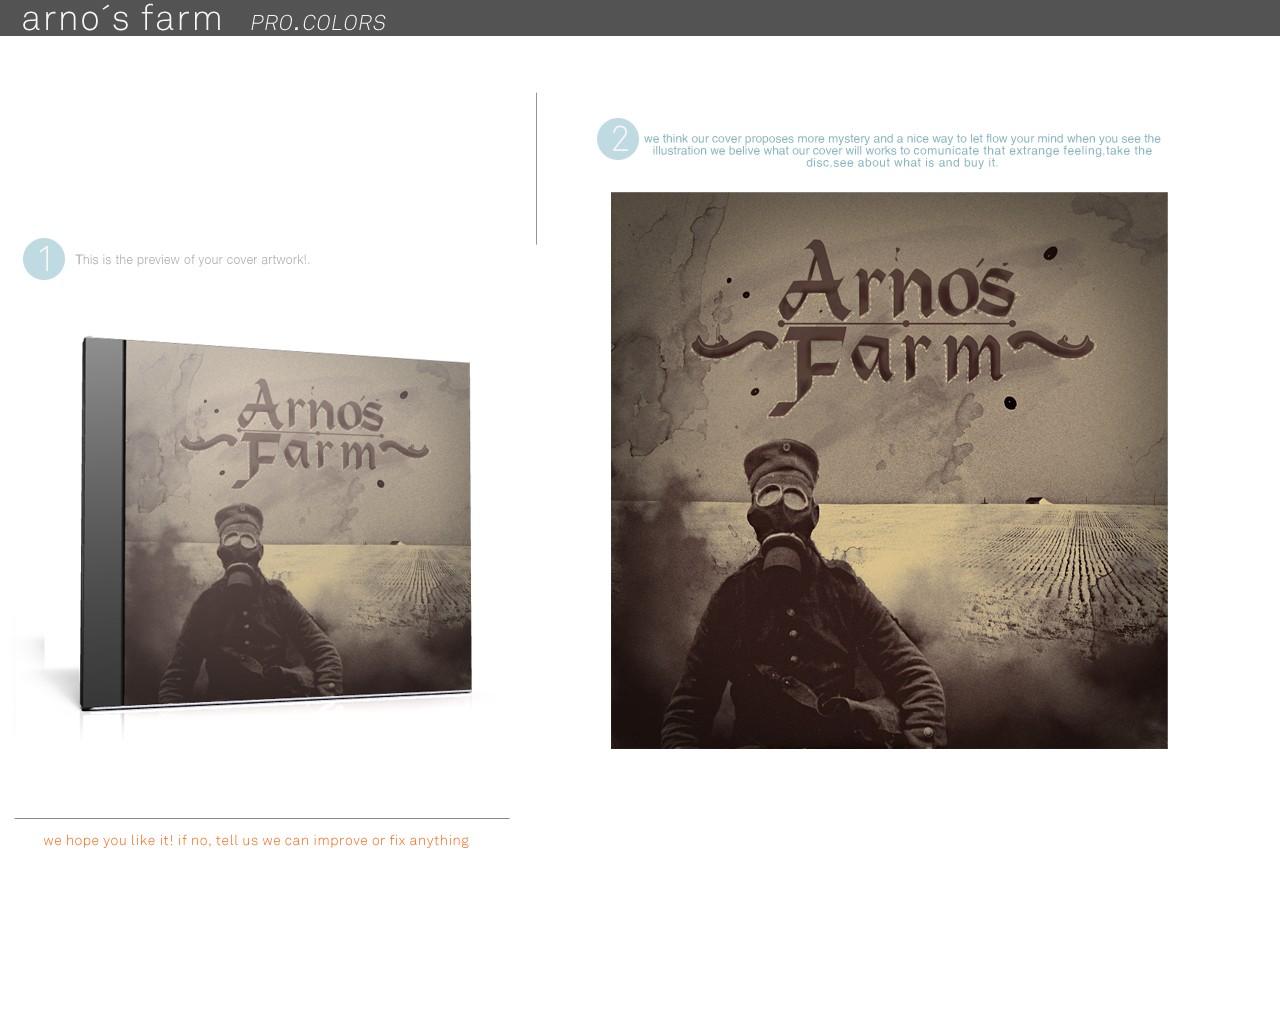 Help Arno's Farm create a CD album cover!